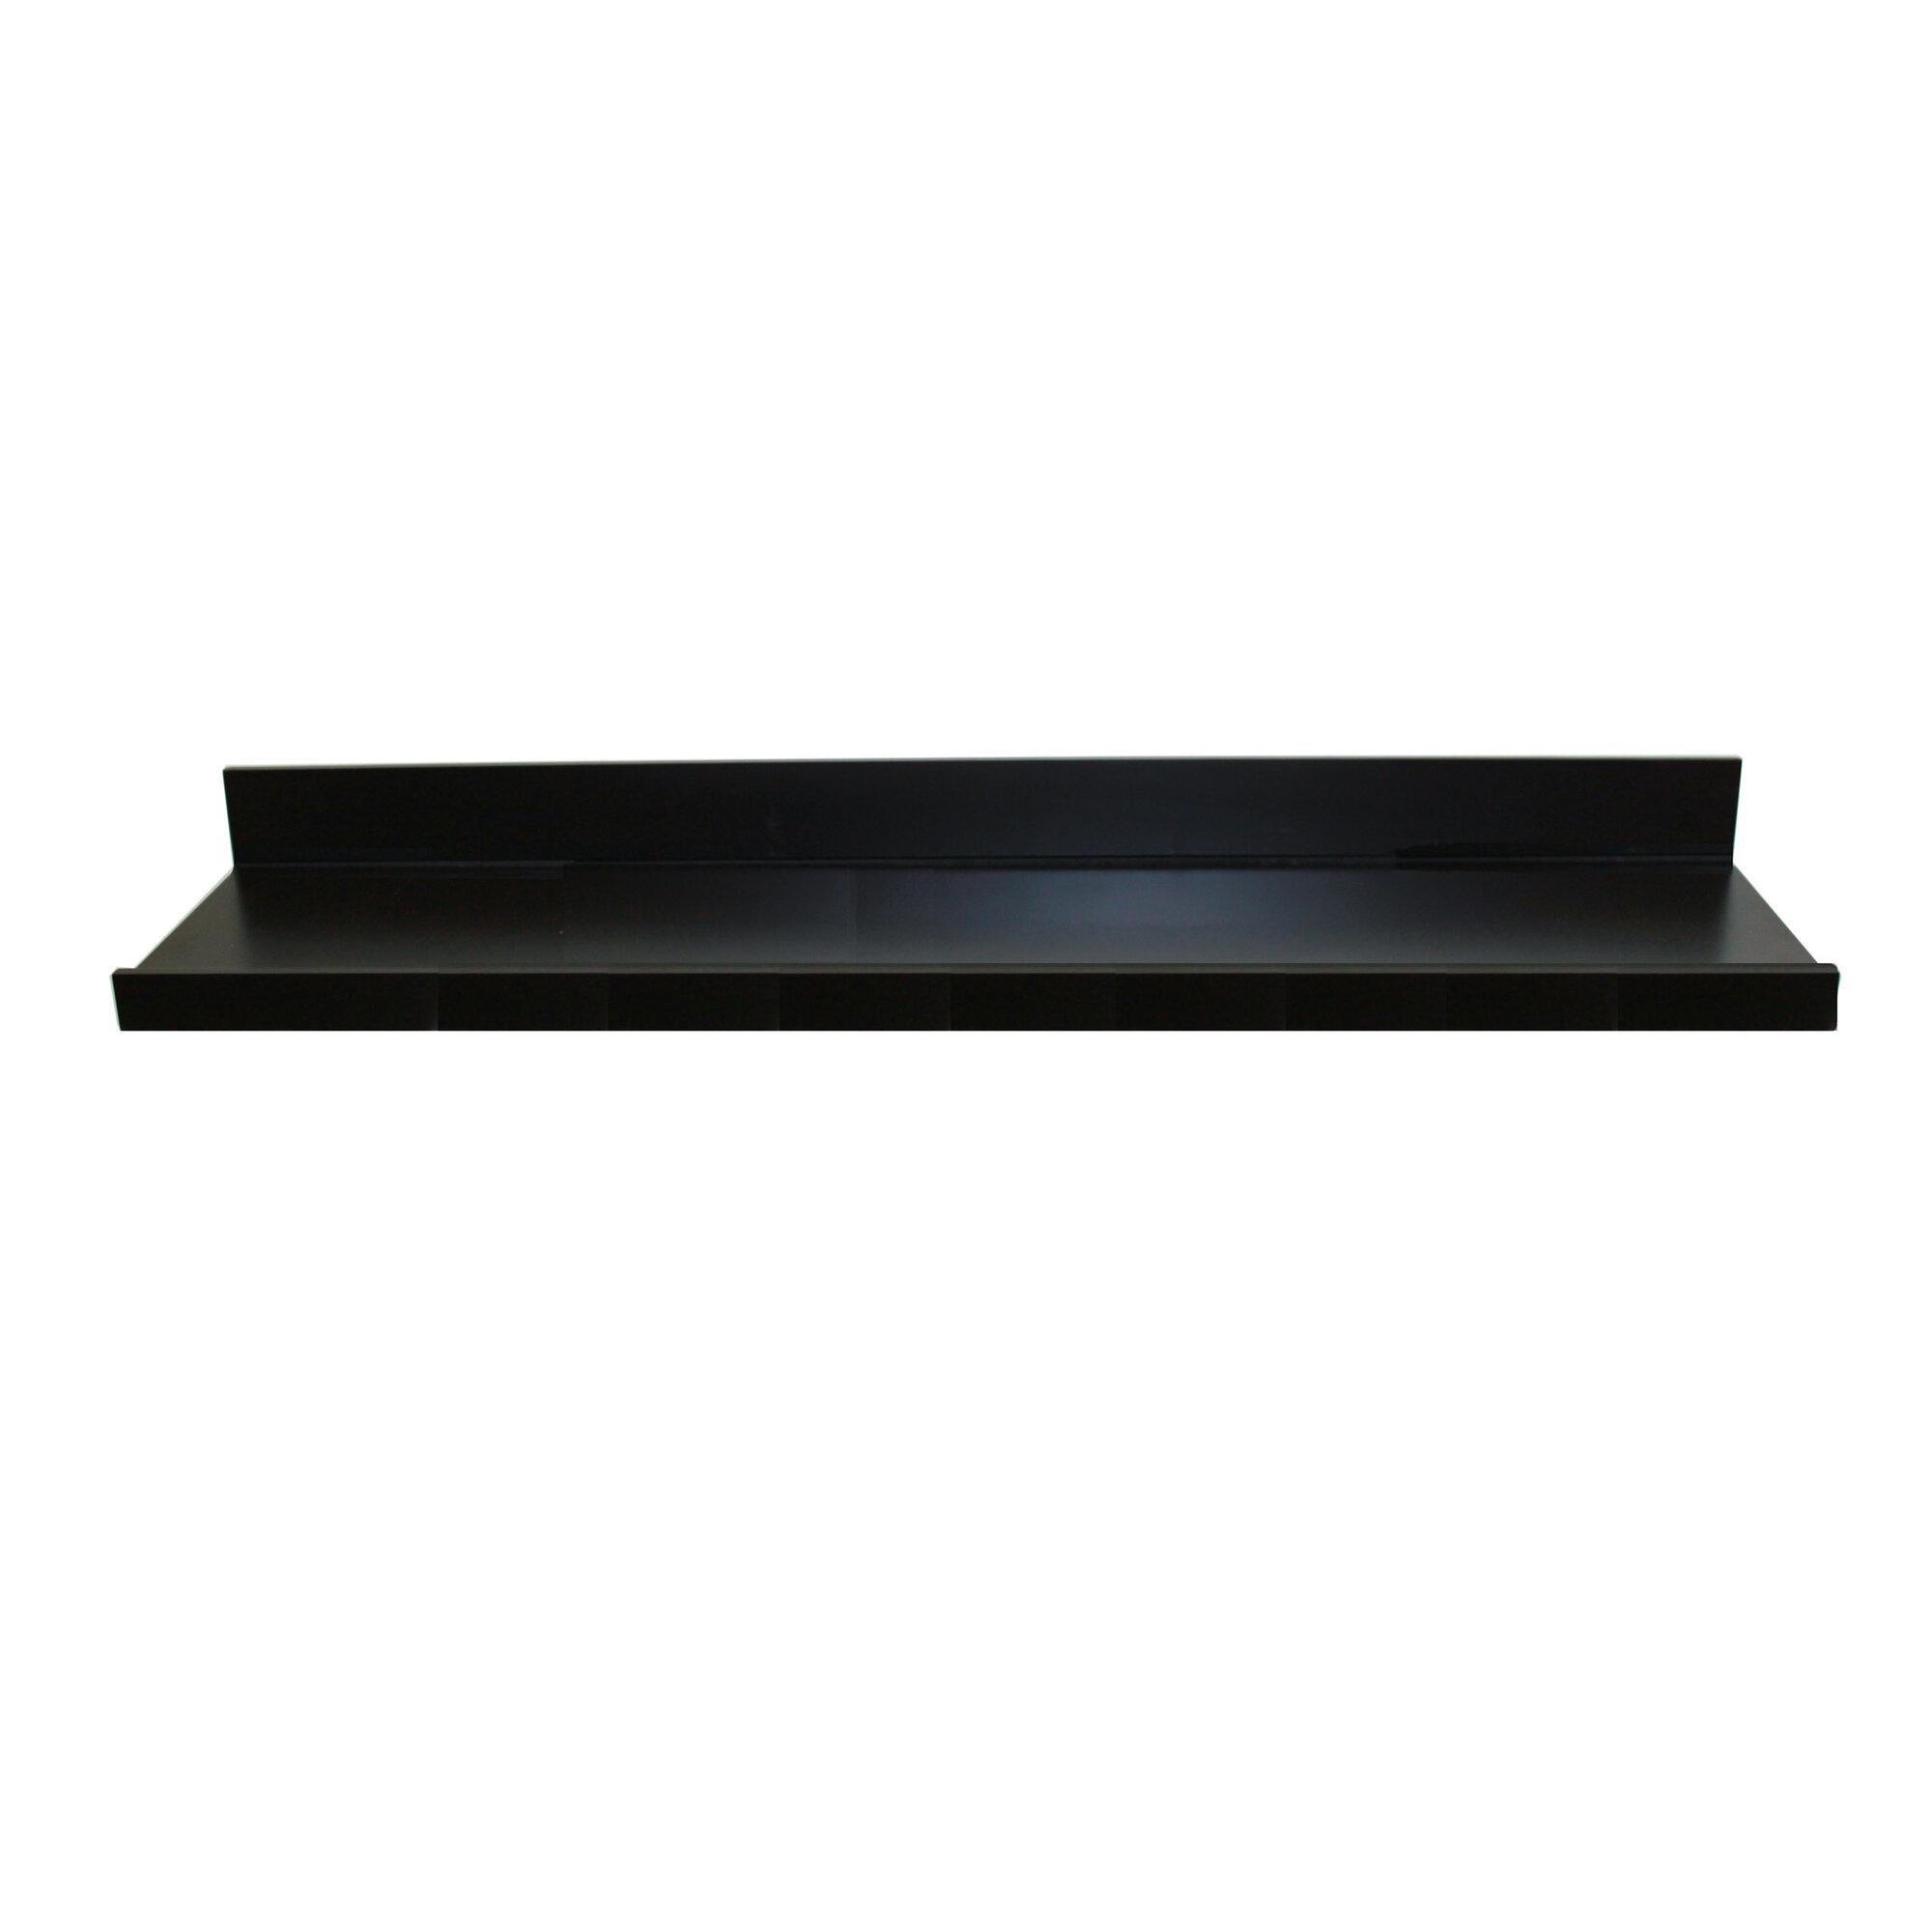 inplace shelving picture ledge floating wall shelf. Black Bedroom Furniture Sets. Home Design Ideas